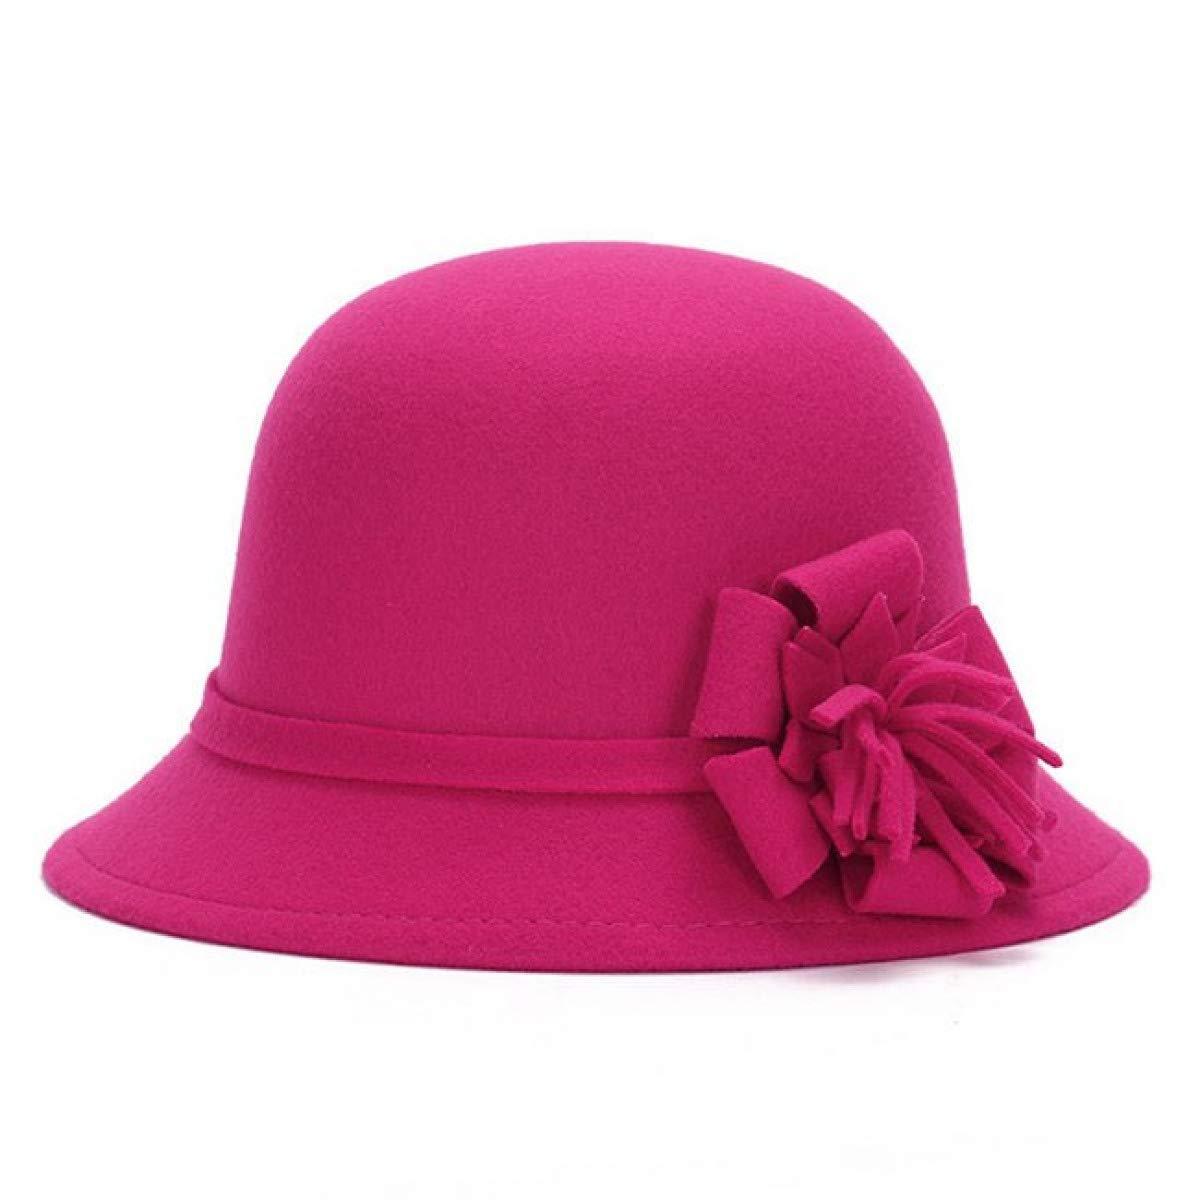 Myhome99 Women Wool Felt Fedora Flowers Hat Ladies Wide Brim Hat Autumn Winter Noble European American Elegant Girls Fashion Cap Royal Blue 2